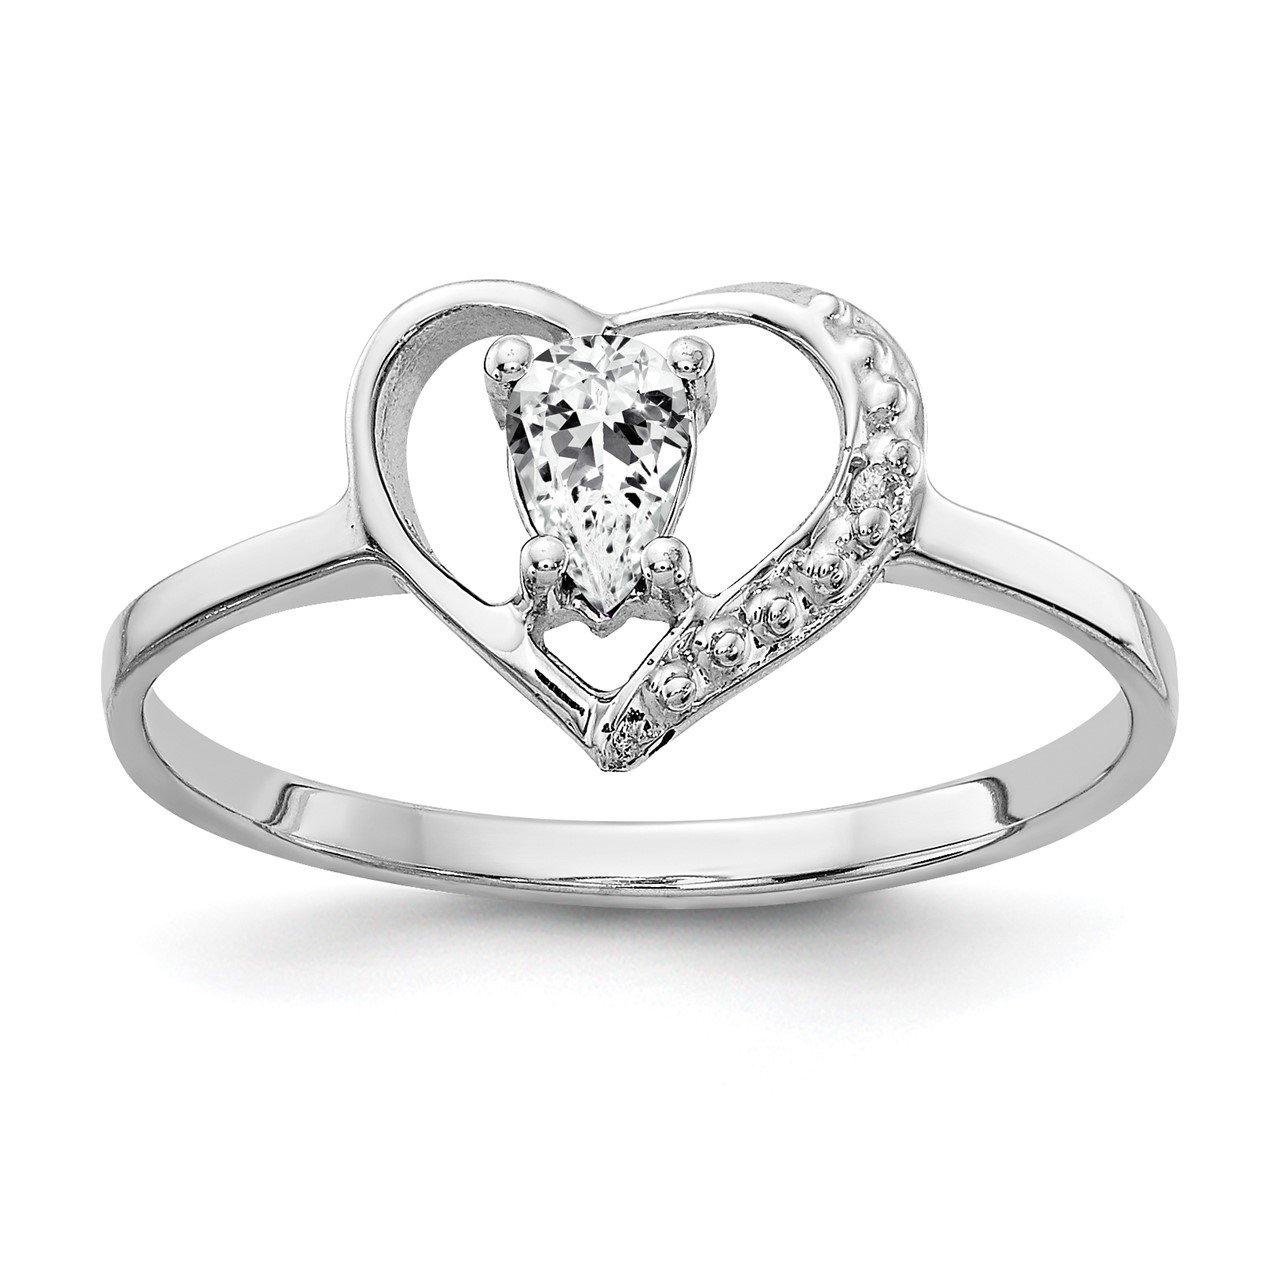 14k White Gold 5x3mm Pear Cubic Zirconia VS Diamond ring